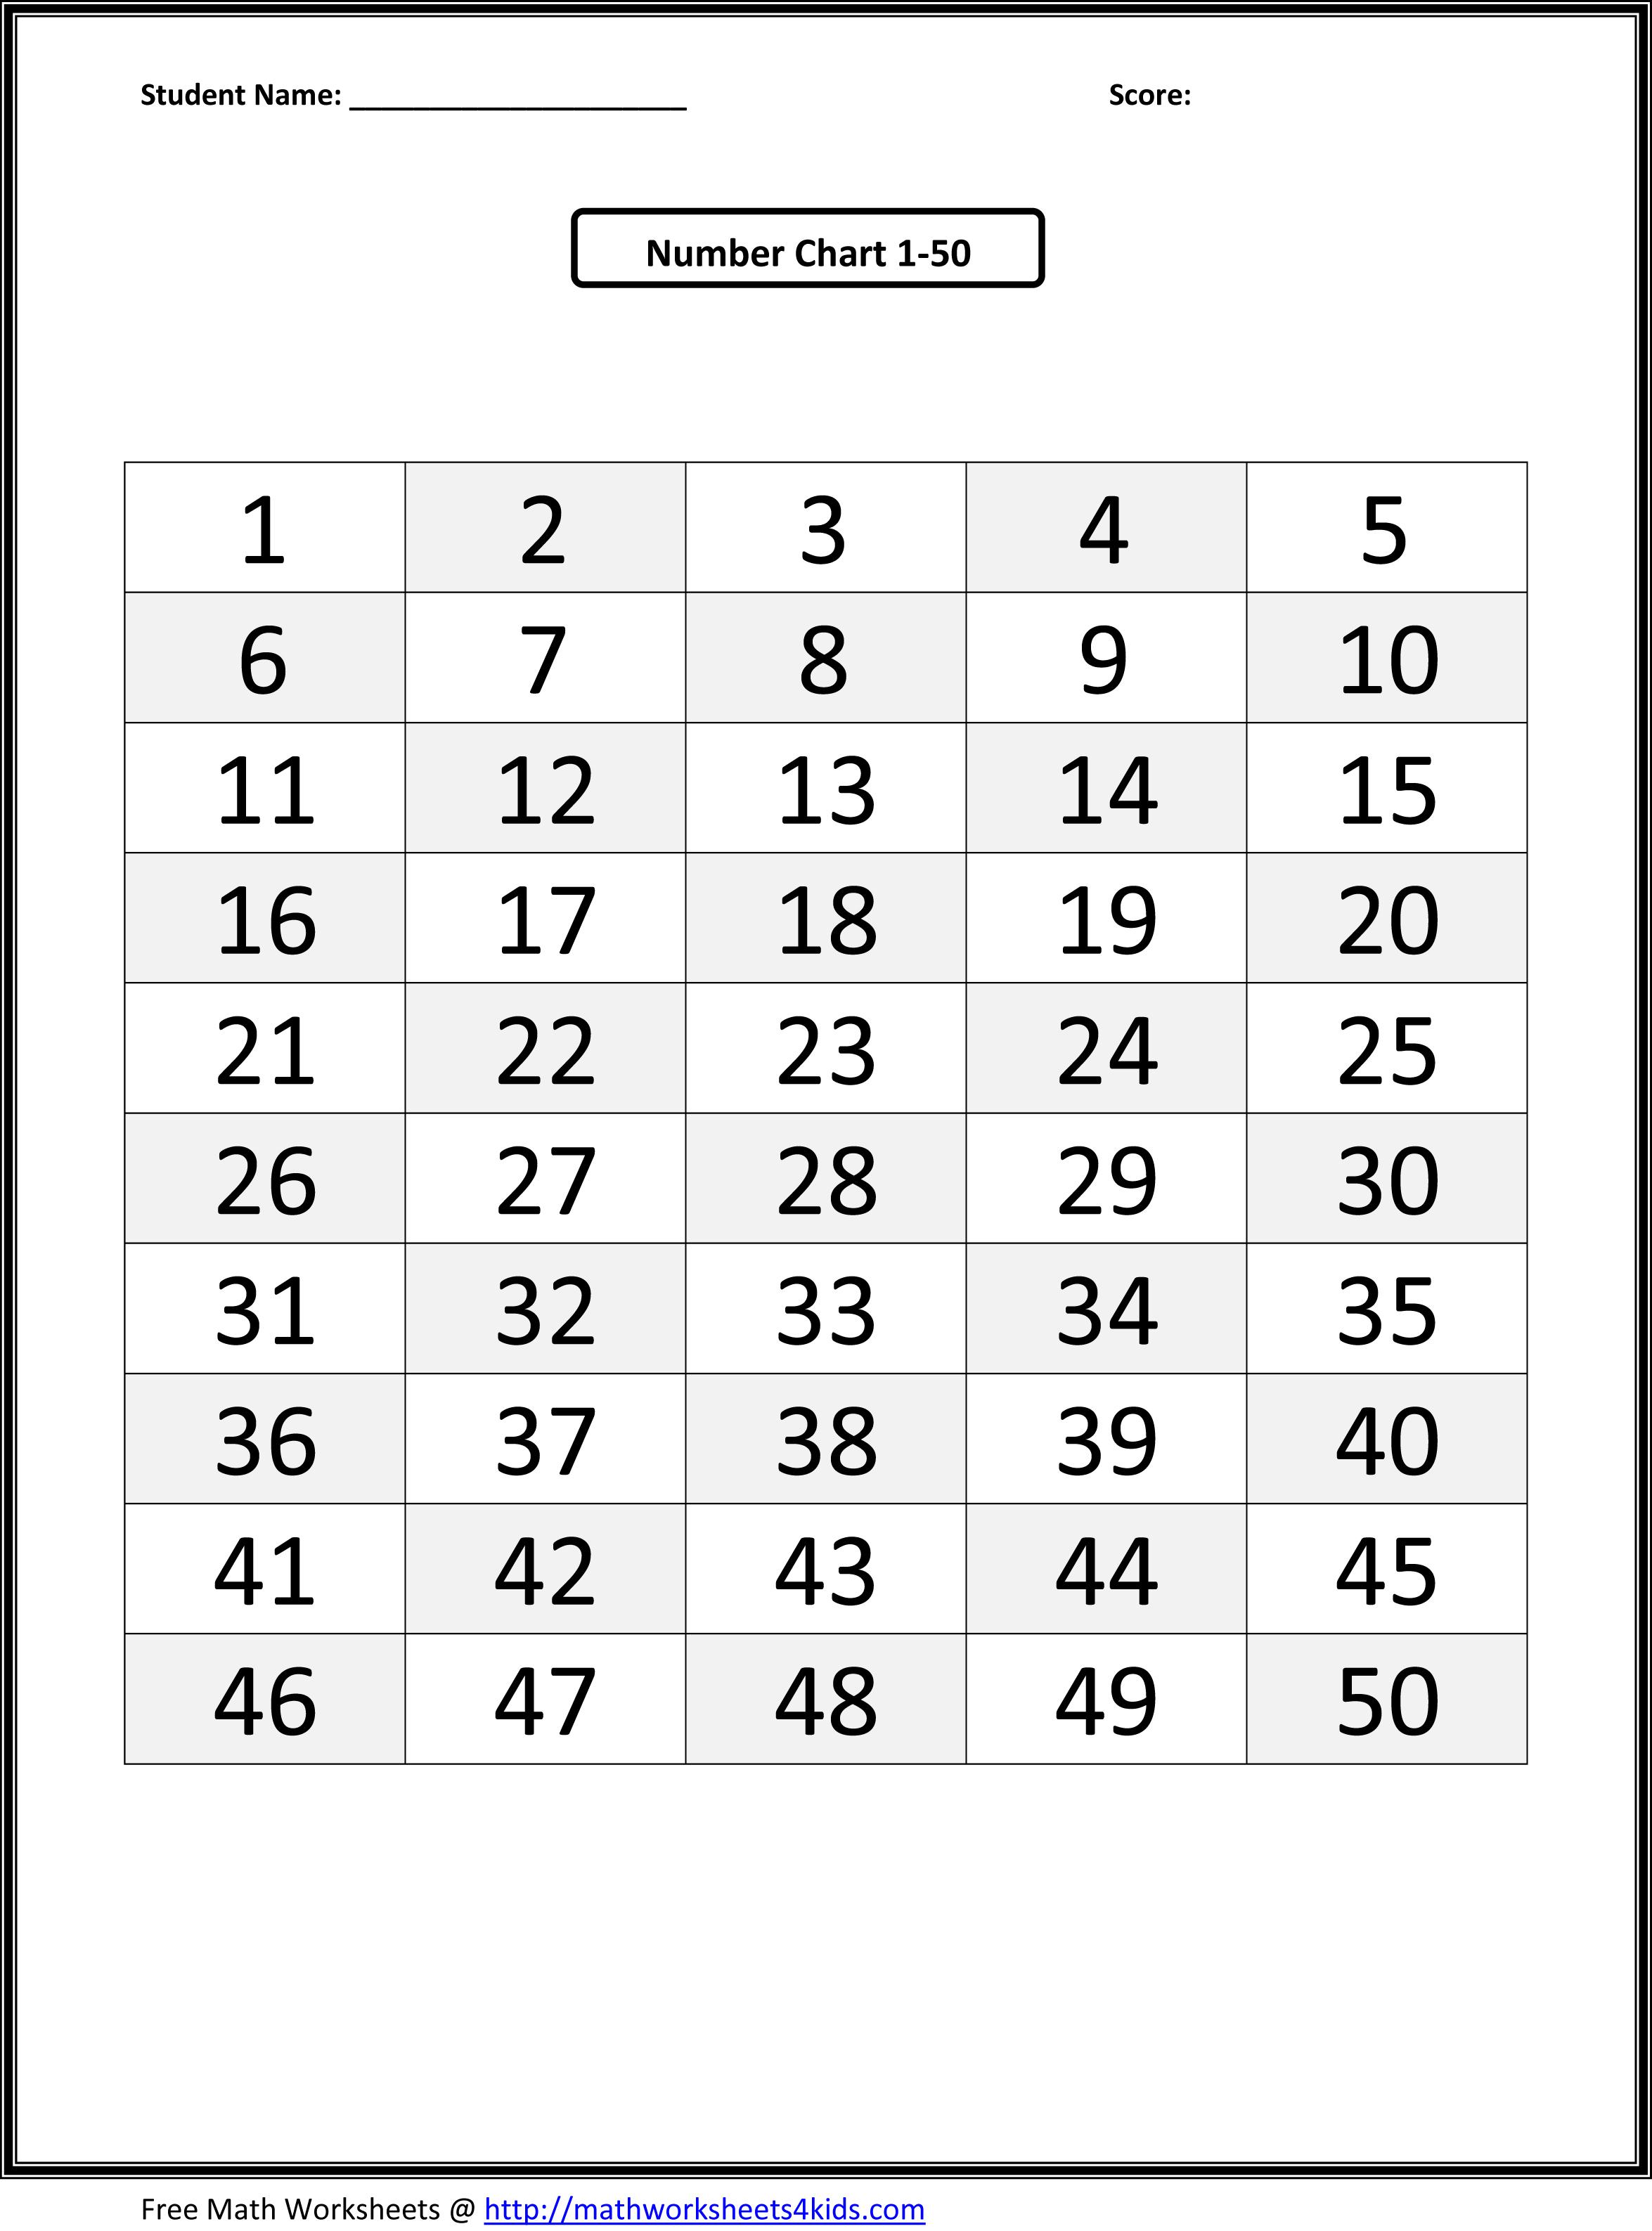 17 Best Images Of Multiplication Worksheets 50 Problems